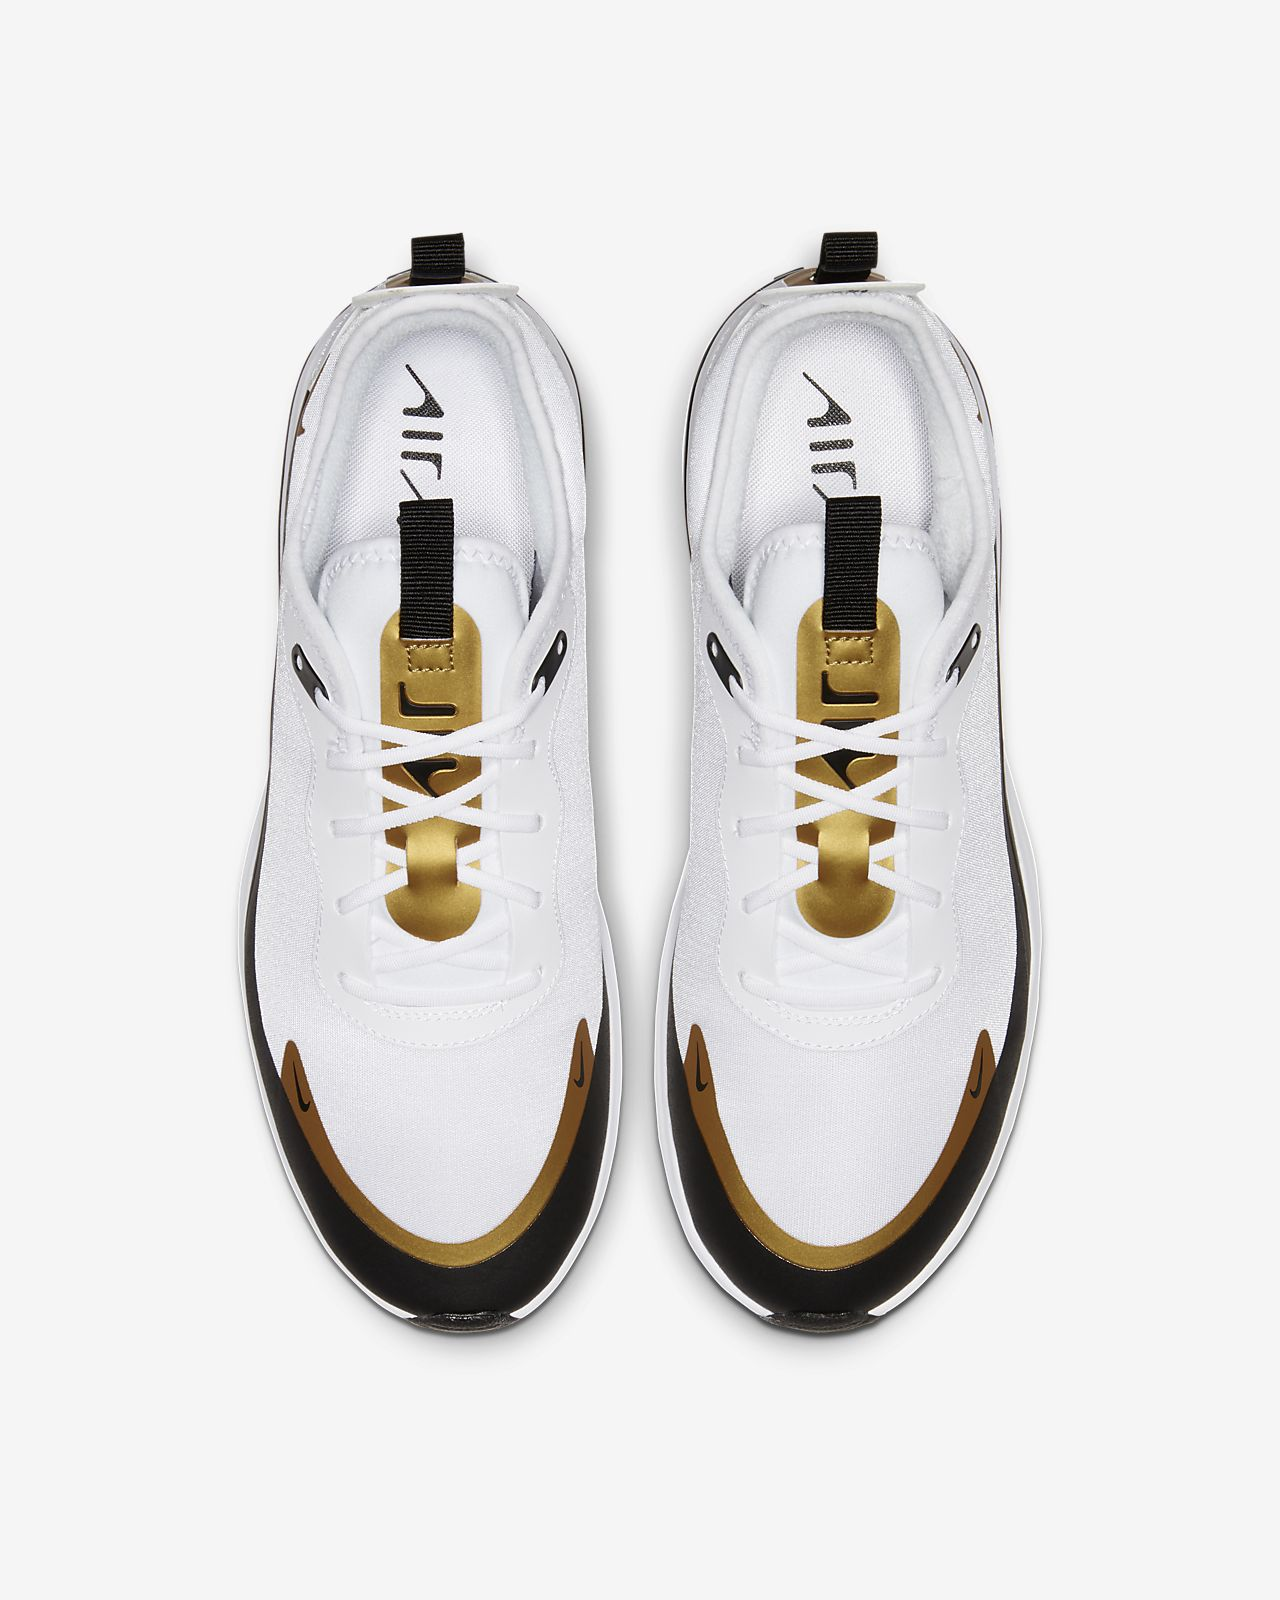 Icon Max Schuh Dia Clash Nike Air kPXlOZuwiT